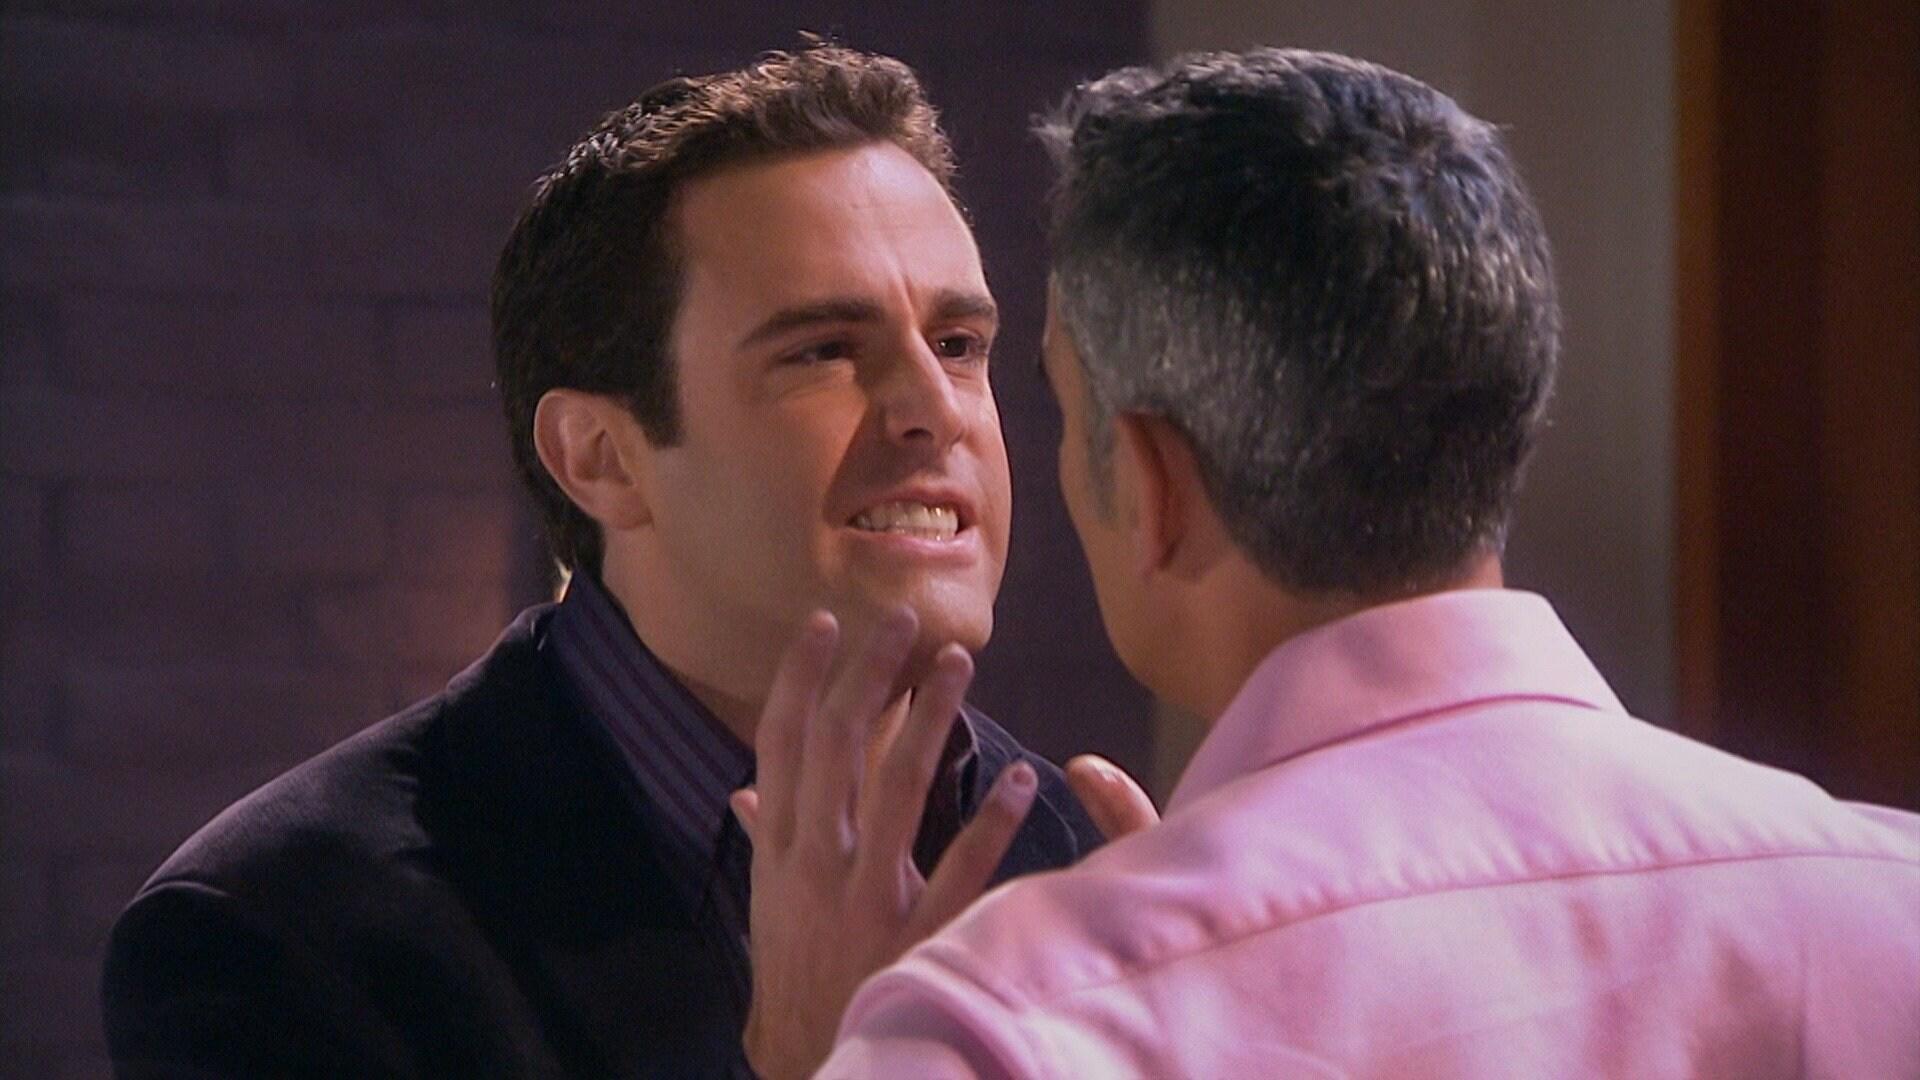 Christian no le teme a Martín